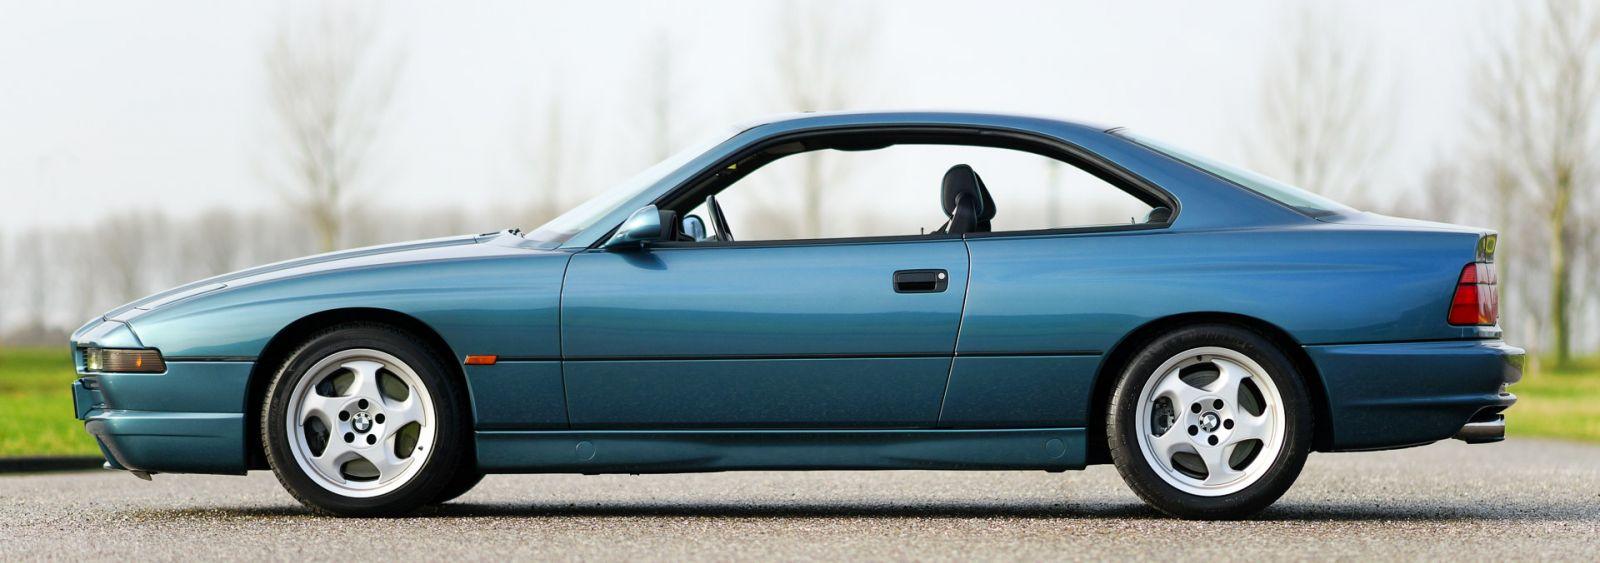 Bmw 850 Csi 1995 Classicargarage De